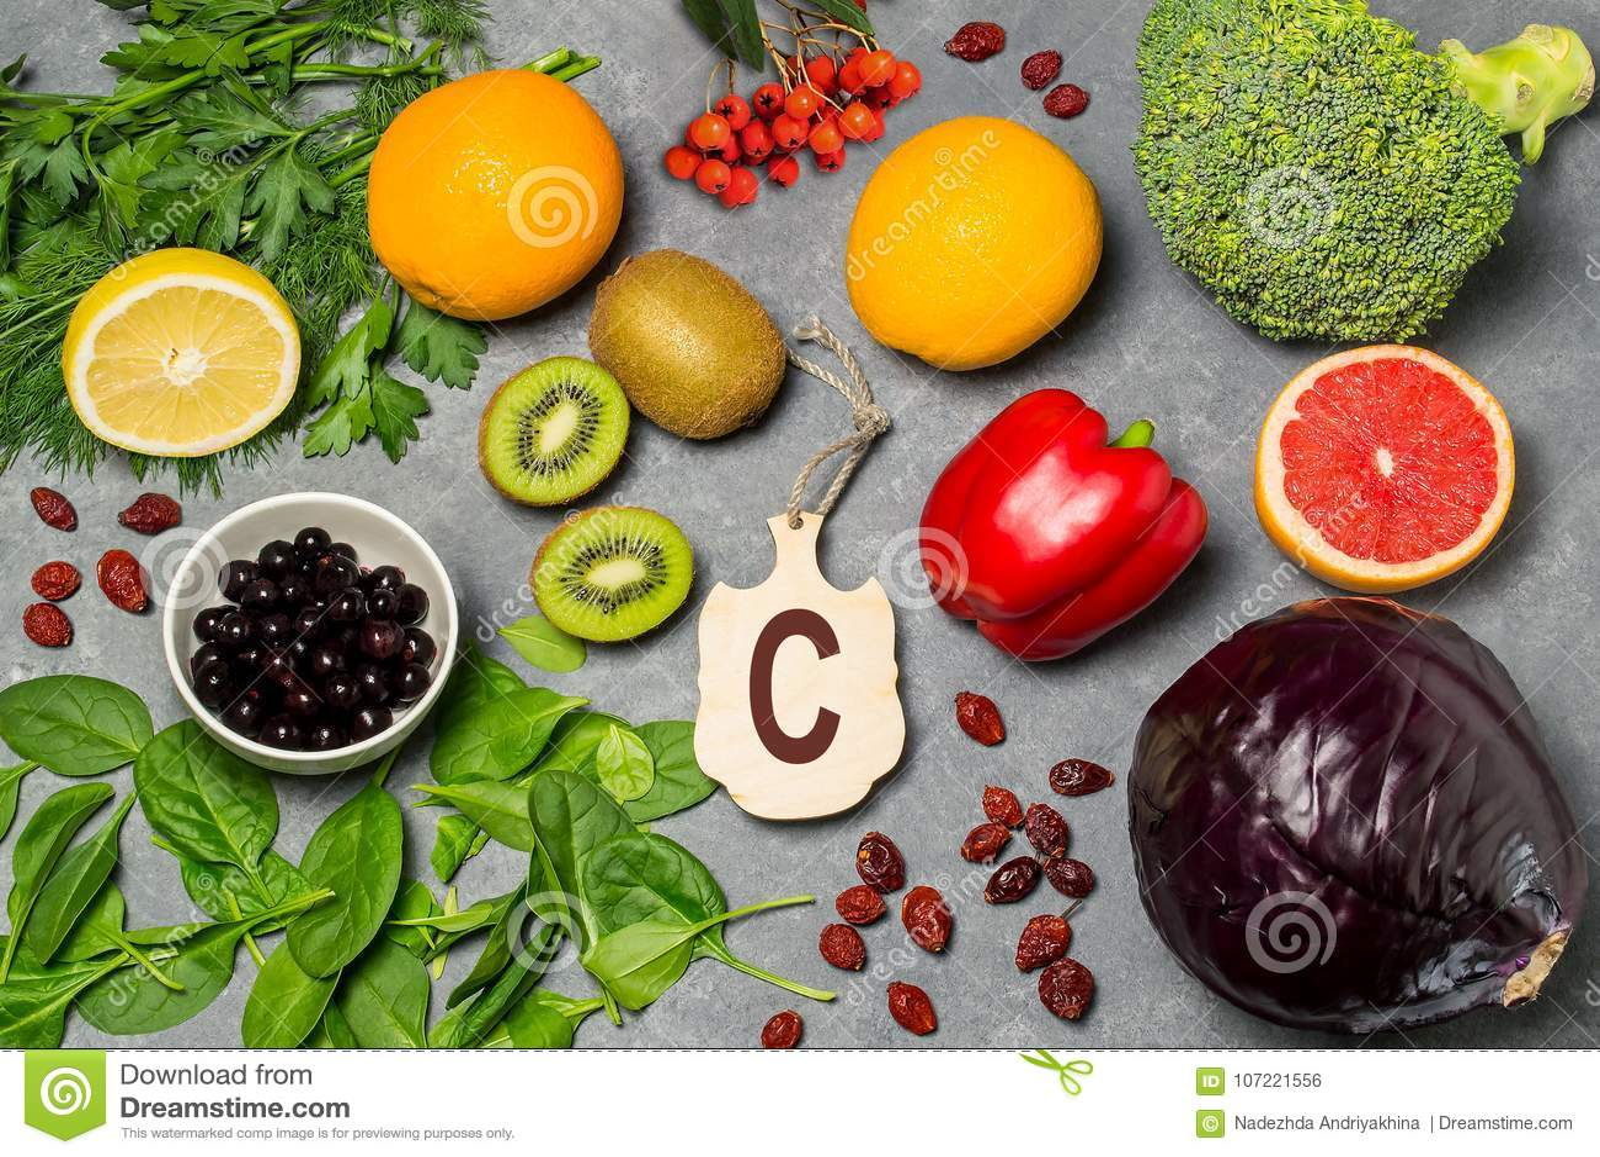 Food is source of vitamin C